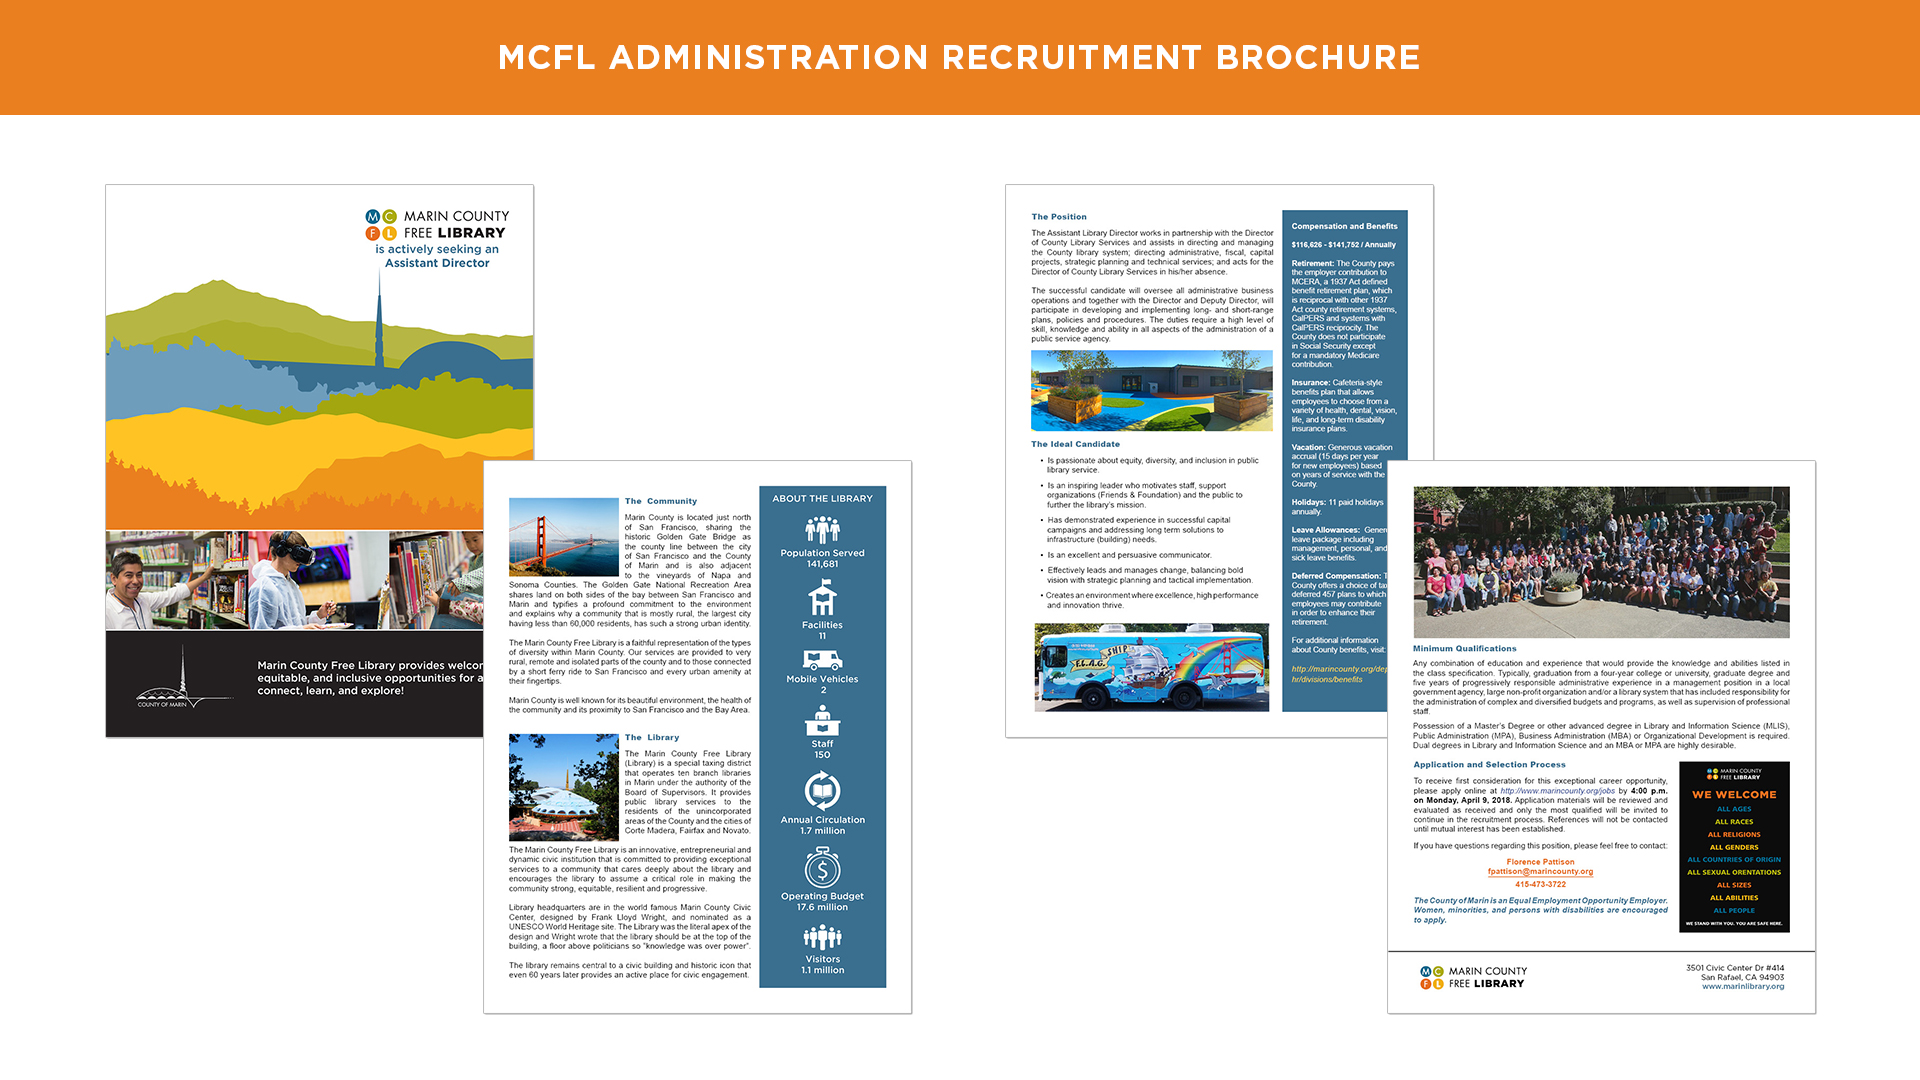 09 - MCFL-Recruitment-Brochure-(Portfolio-Mock-up).jpg